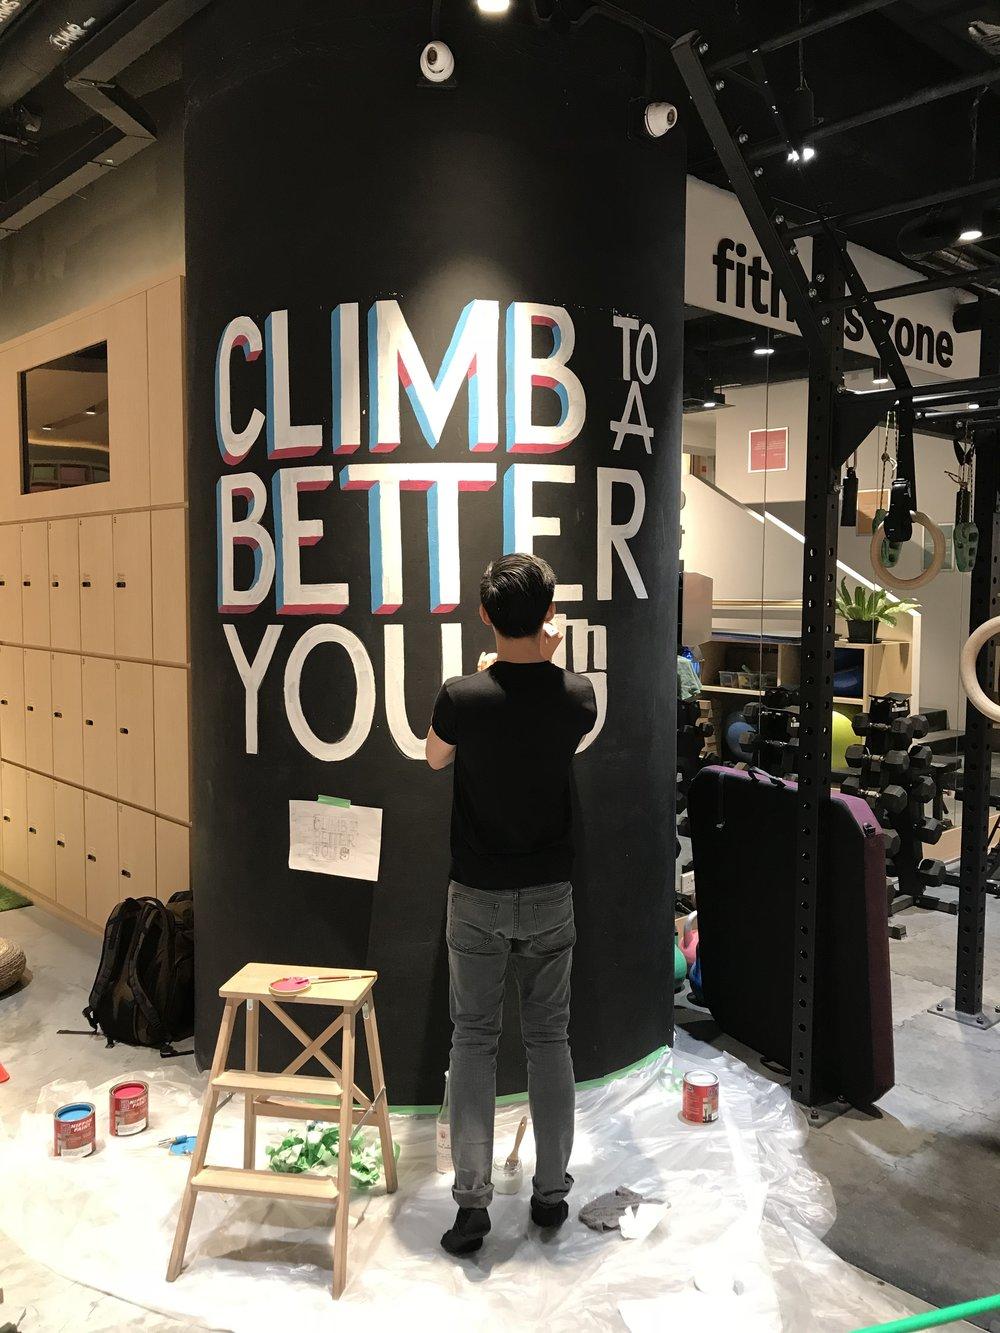 Climb to a Better You - Boulder Movement - Process